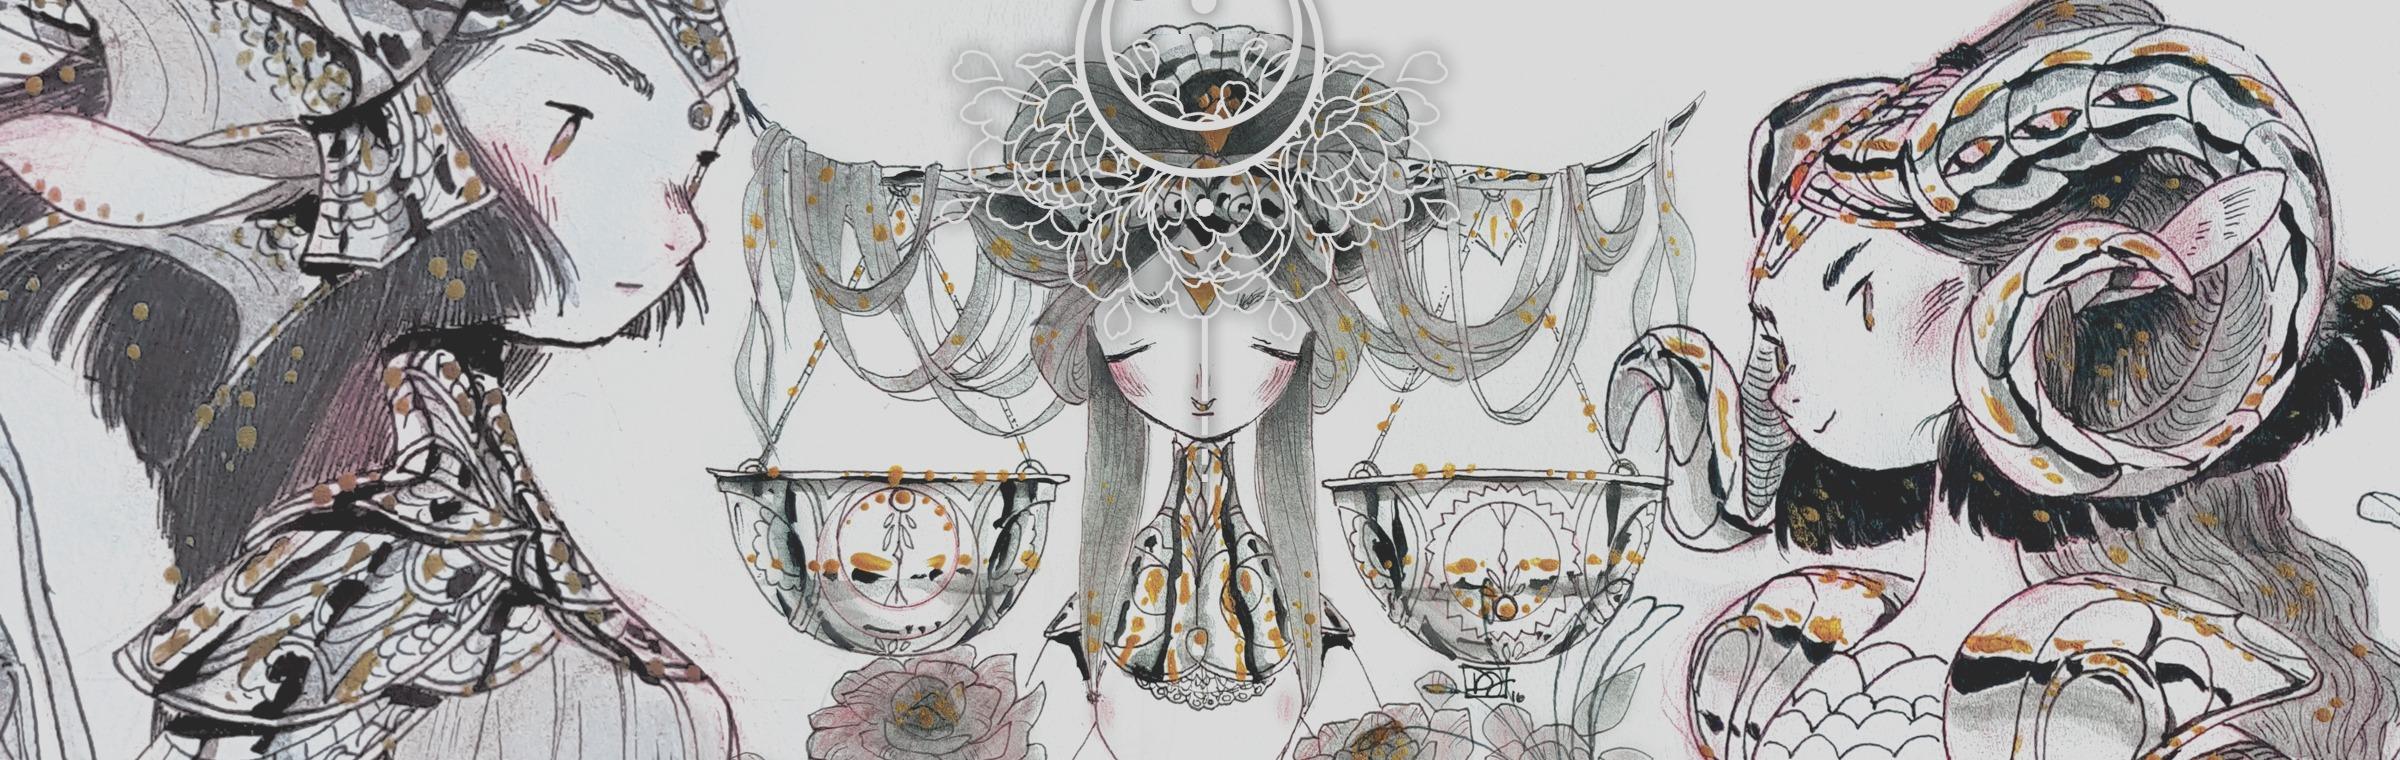 🌌#Inktober 21: Sagittarius ♐ (My moon sign! 😀)    - denae*moon